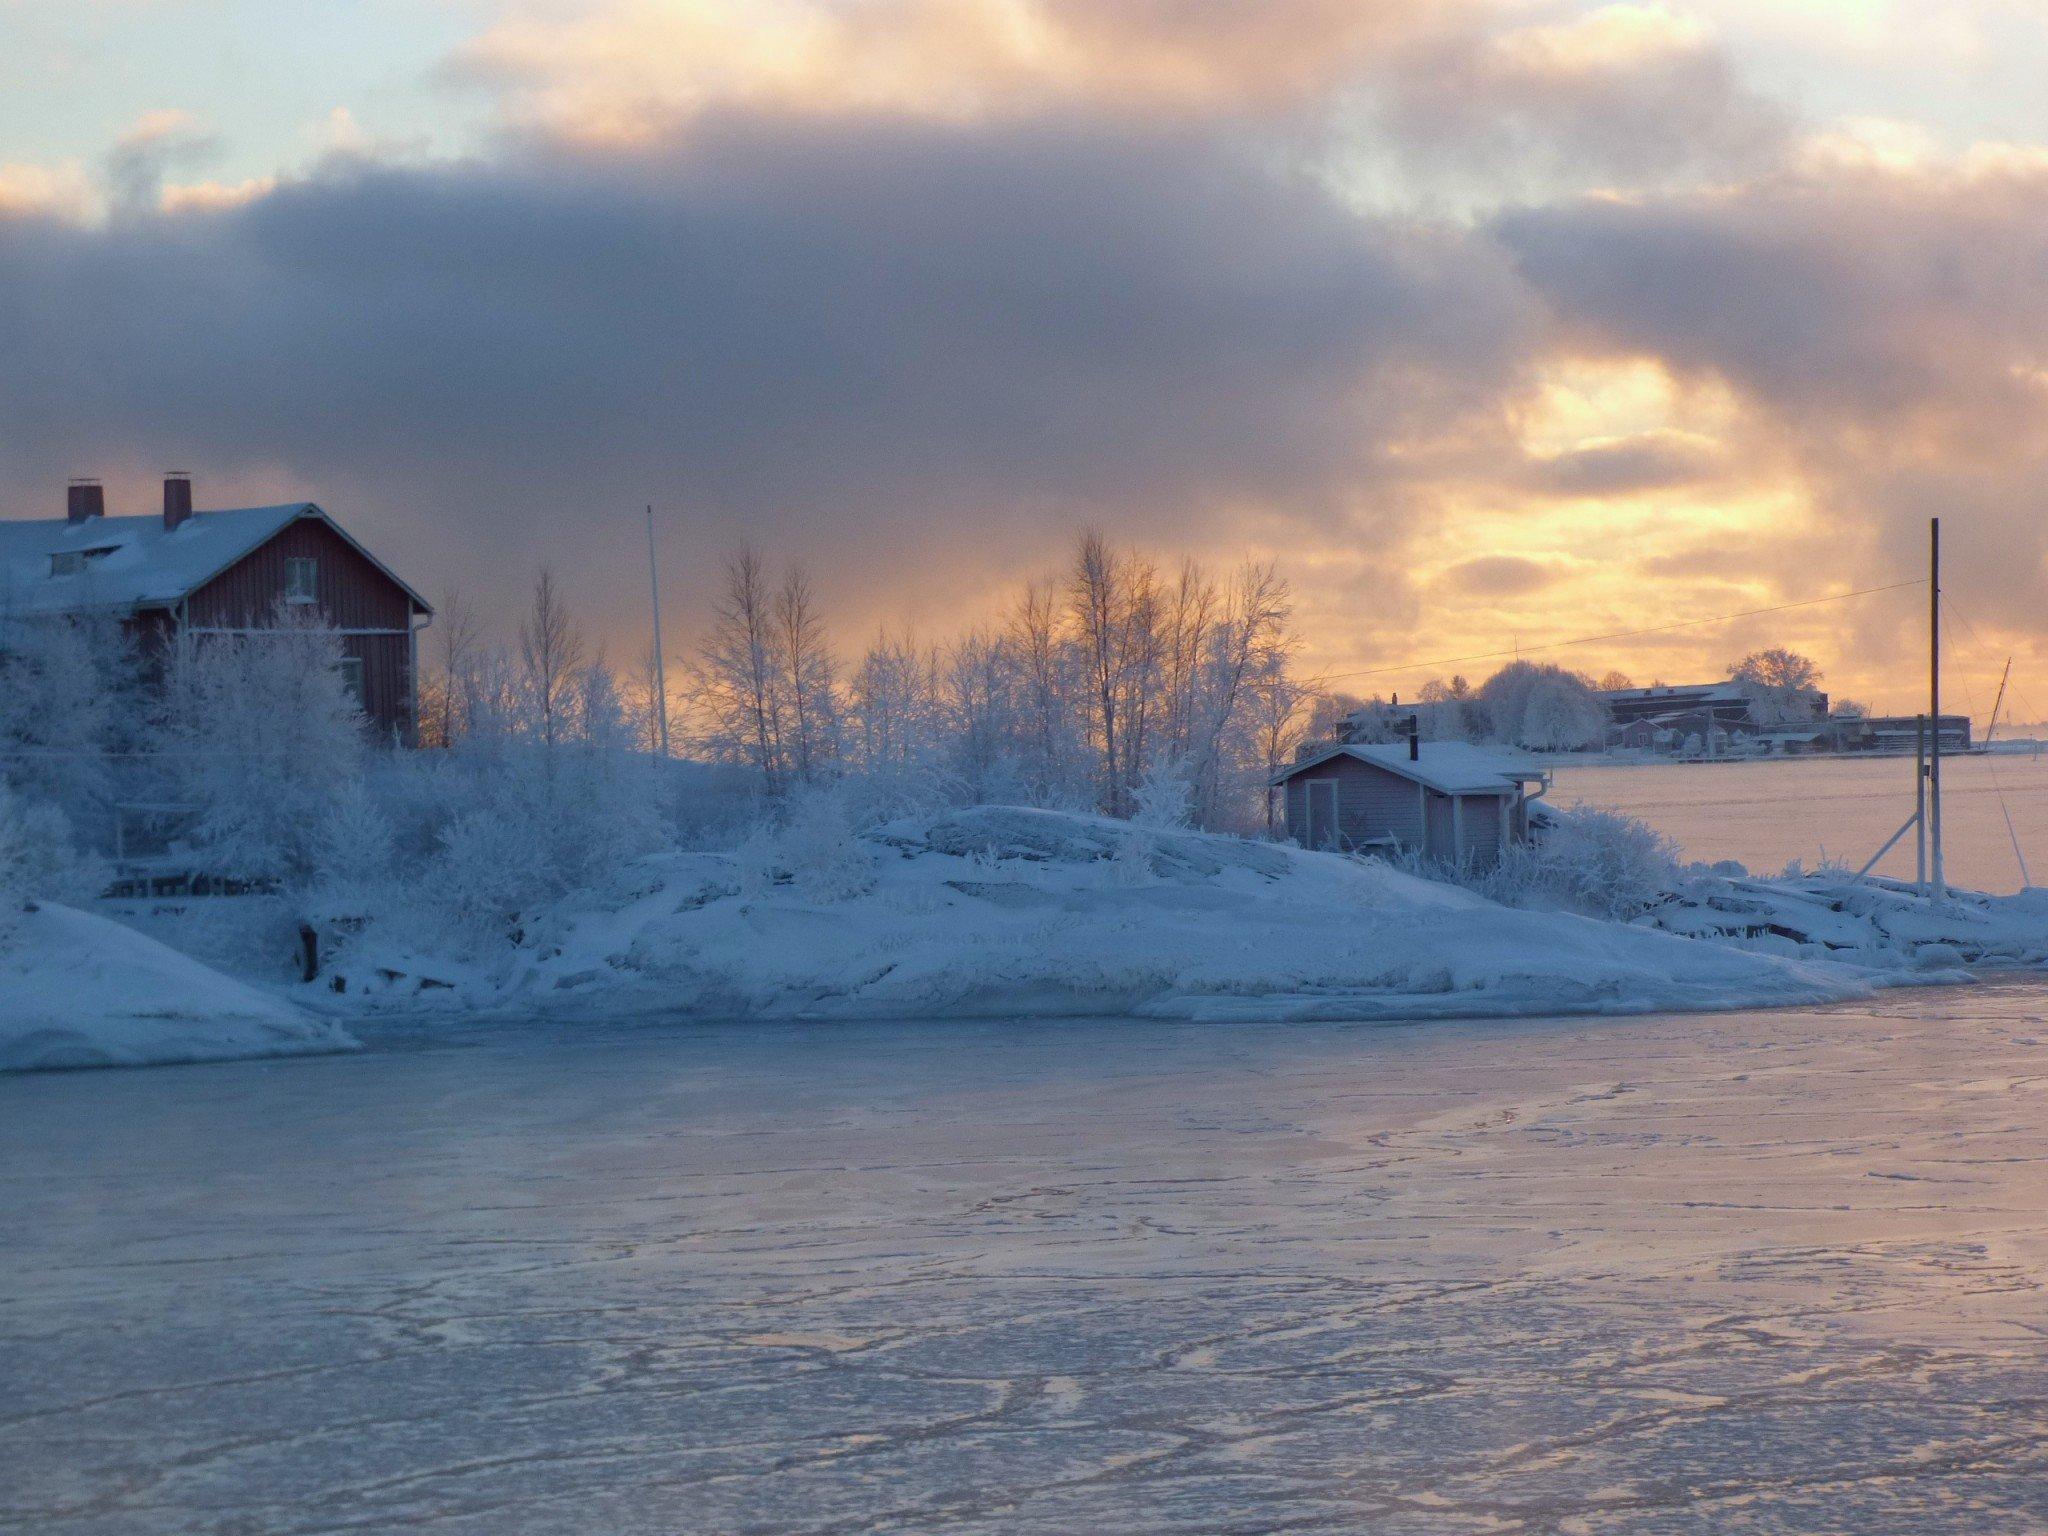 Suomenlinnan lautta tammikuu